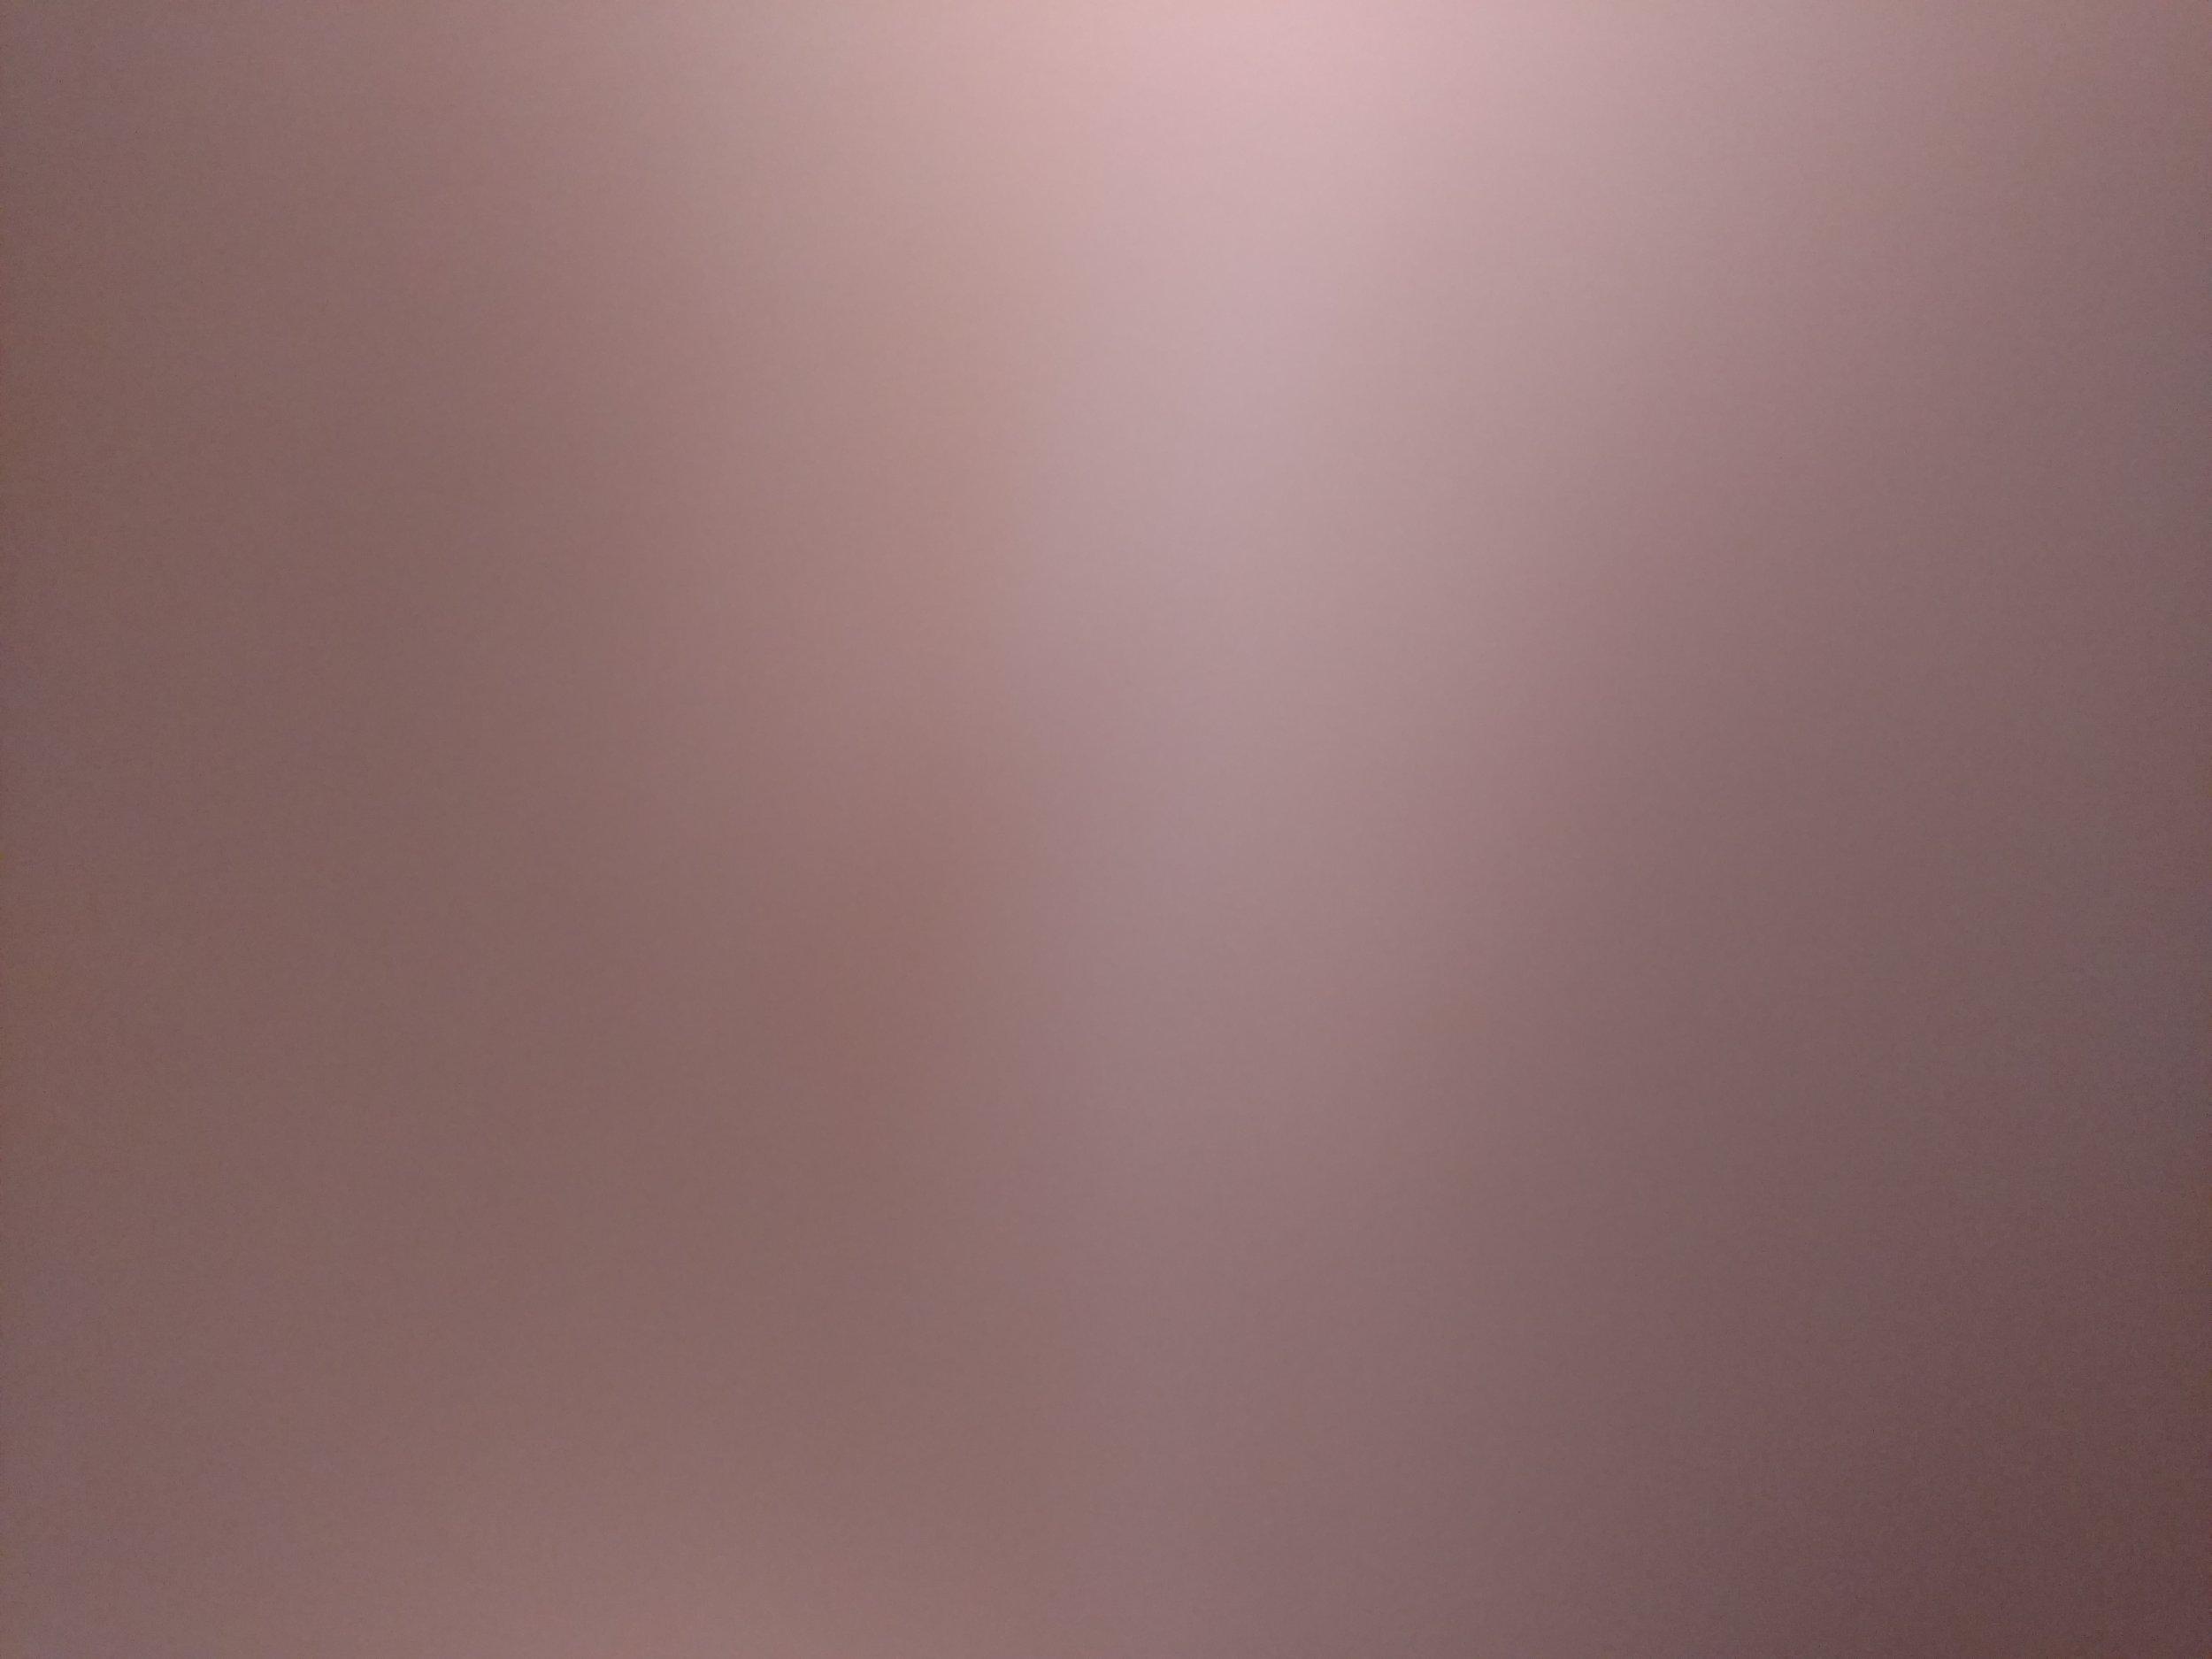 willroth-co-free-texture-gradient-020.jpg